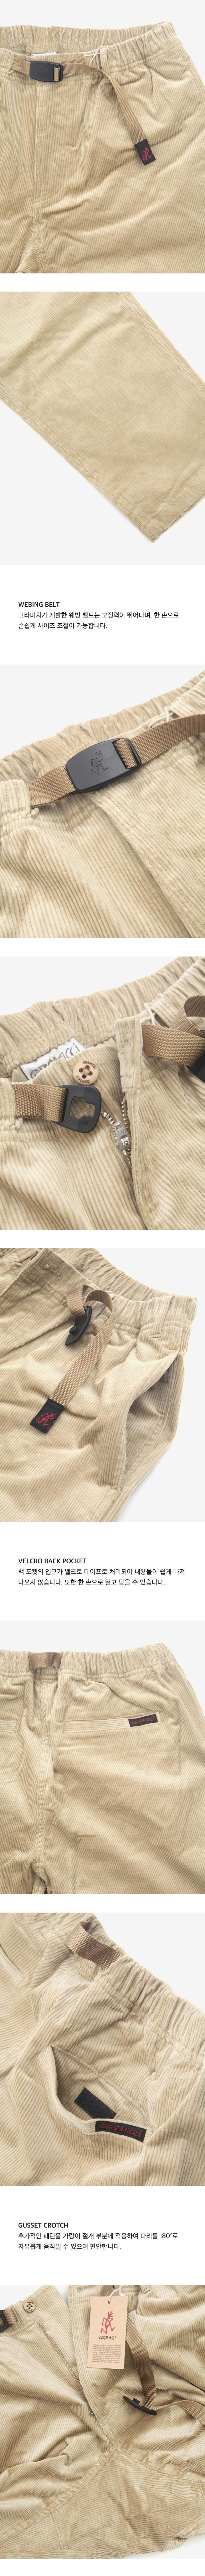 CORDUROY+GRAMICCI+PANTS+BEIGE+(1).jpg